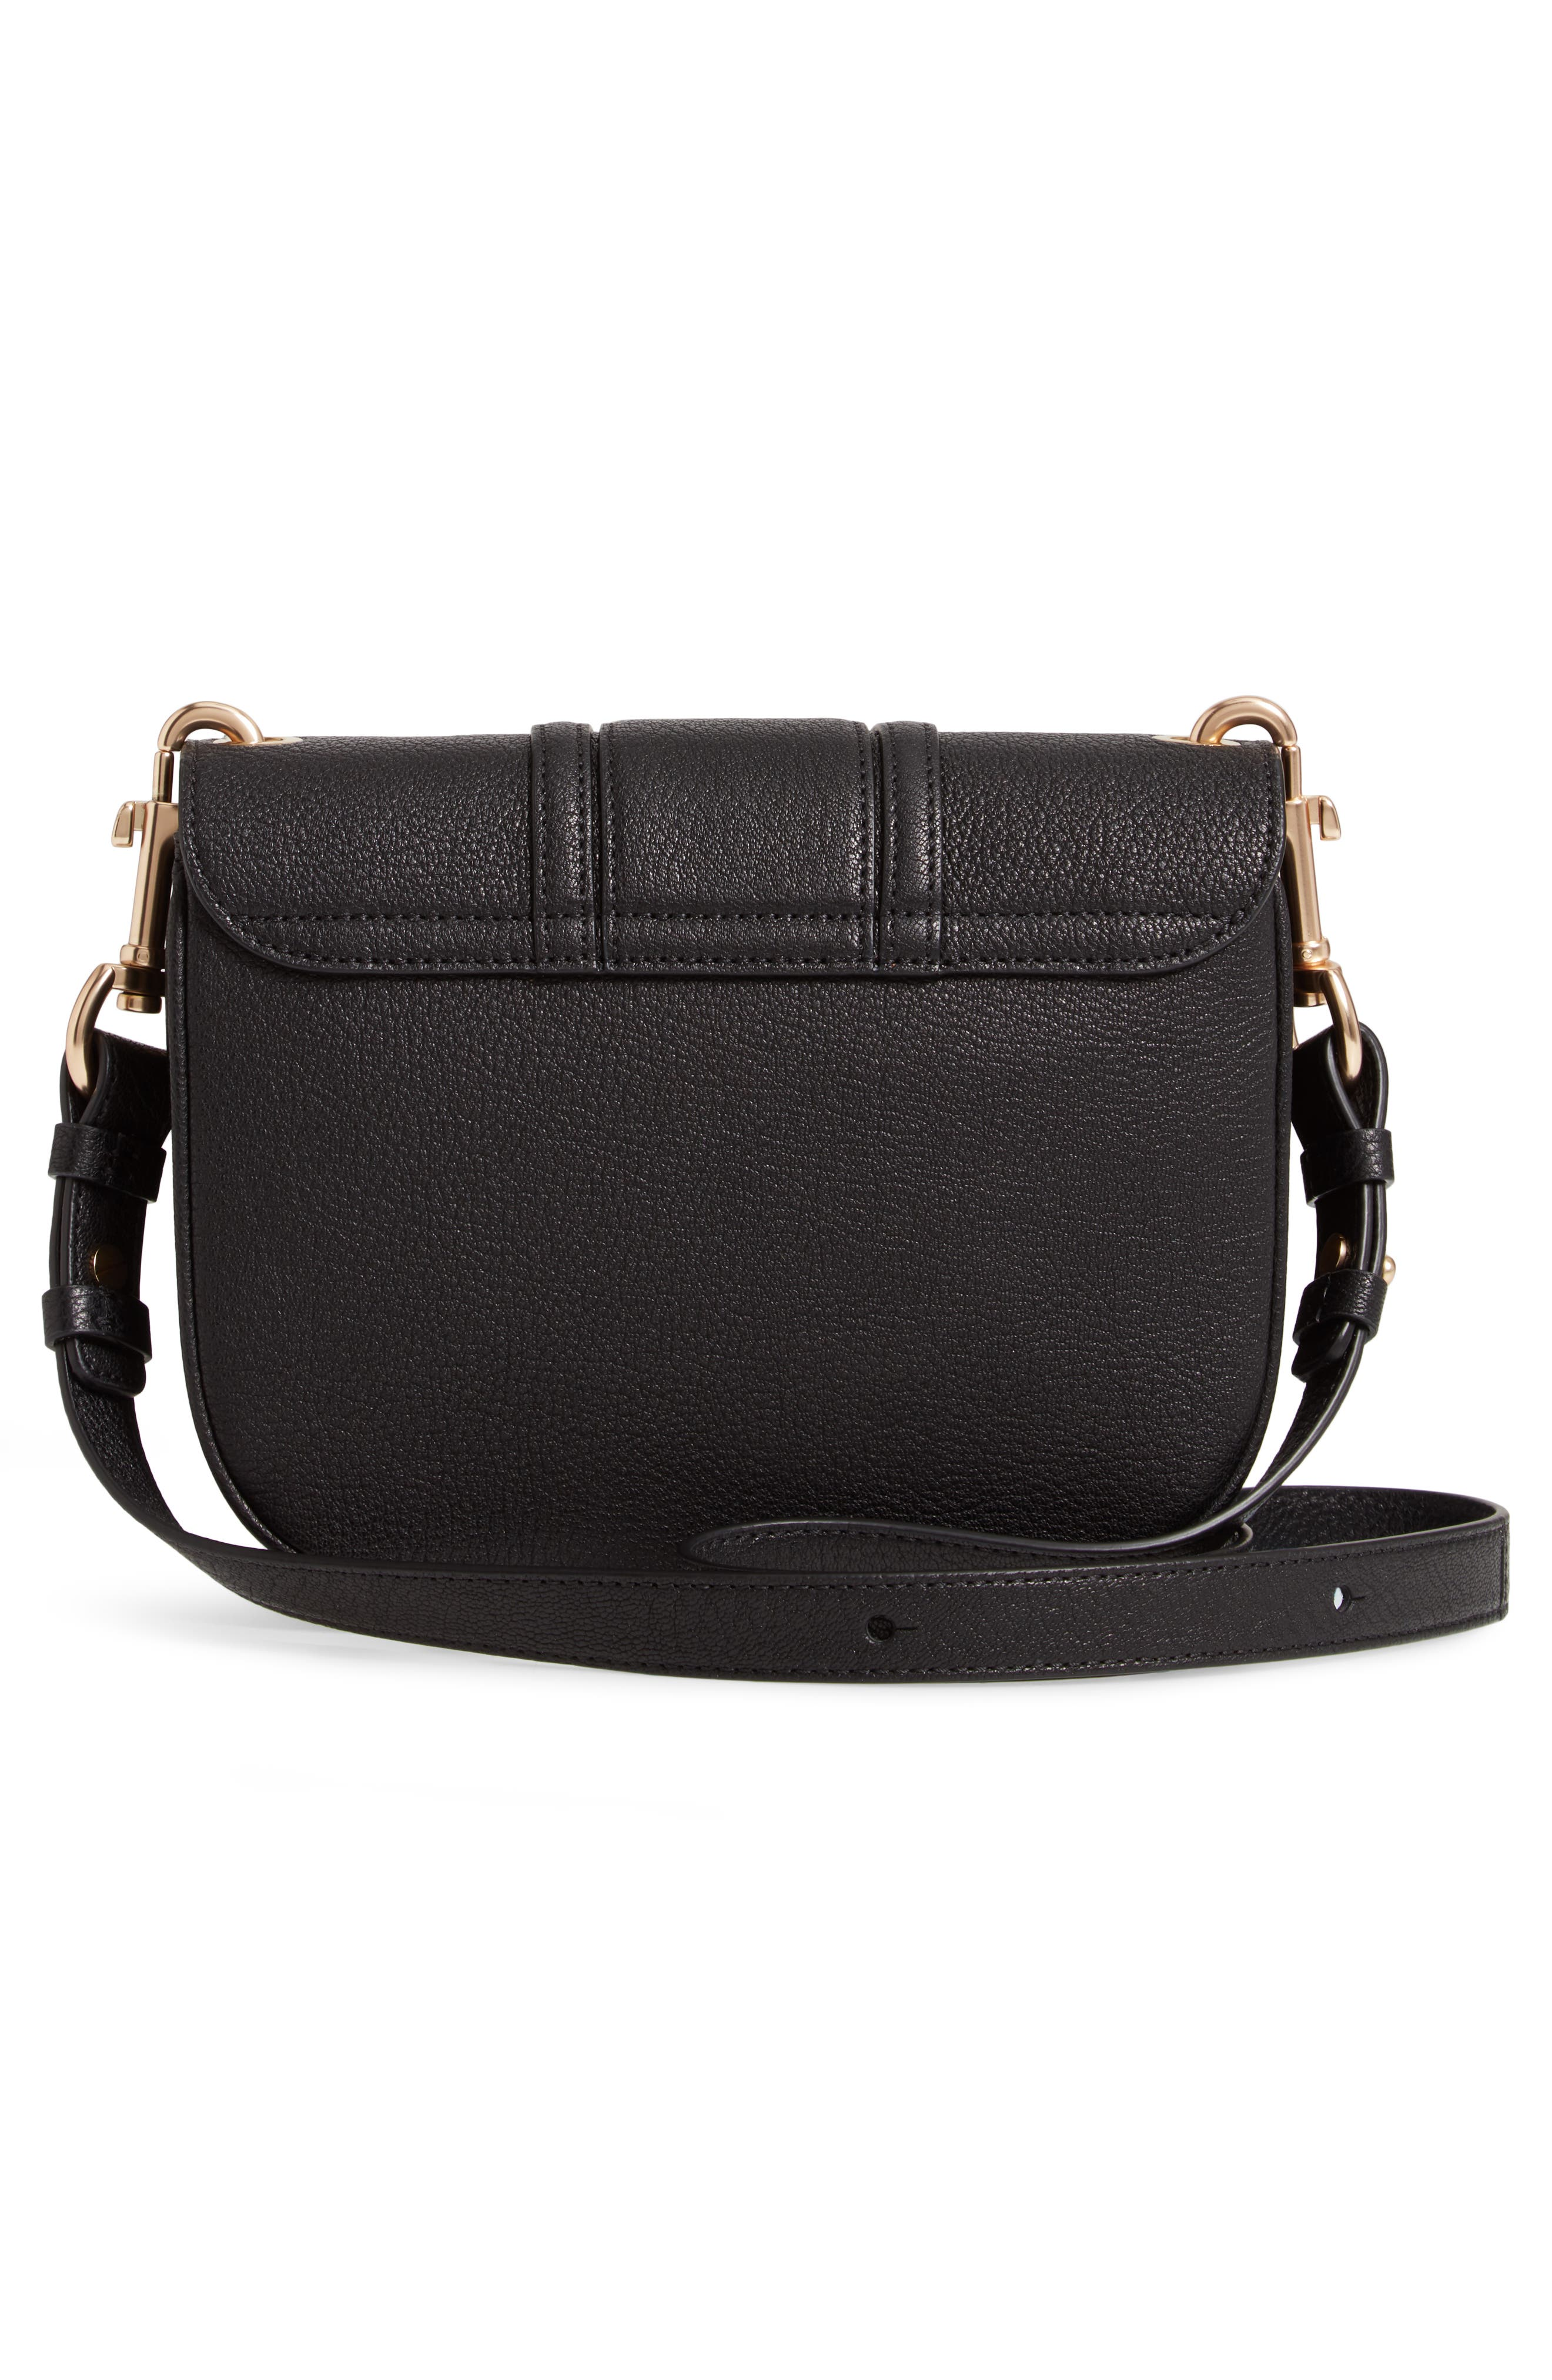 SEE BY CHLOÉ, Hana Small Leather Crossbody Bag, Alternate thumbnail 3, color, 001